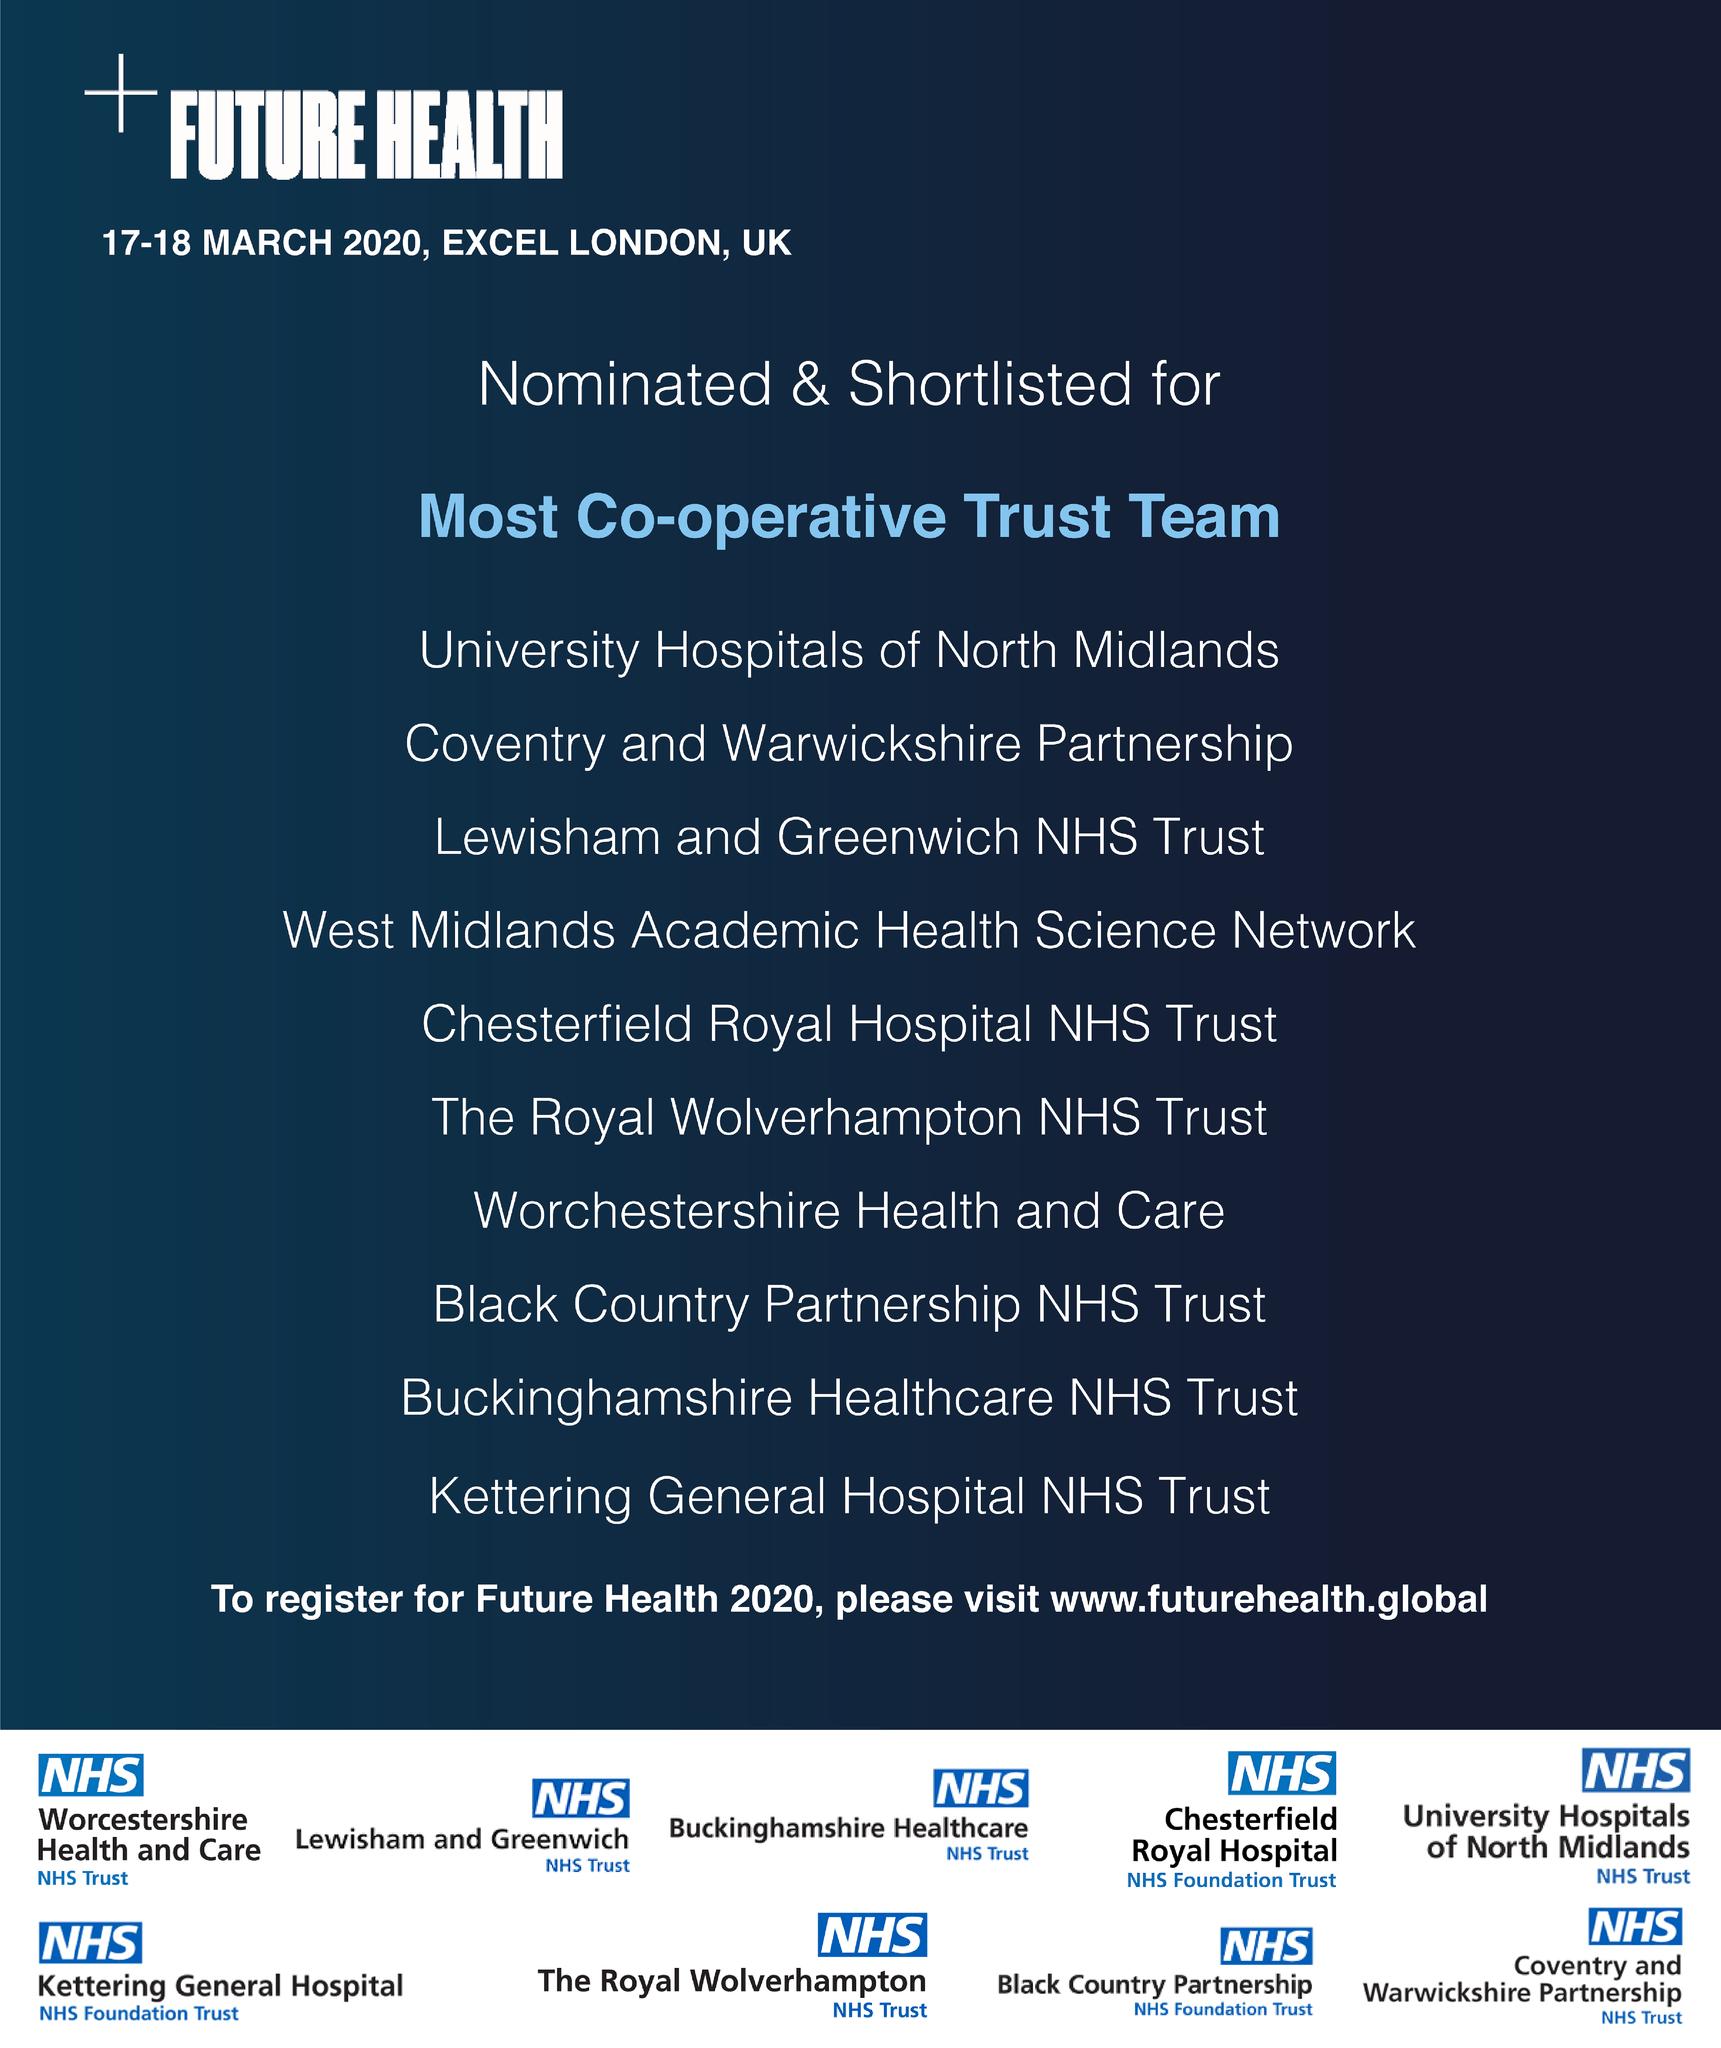 Co-operative Trust